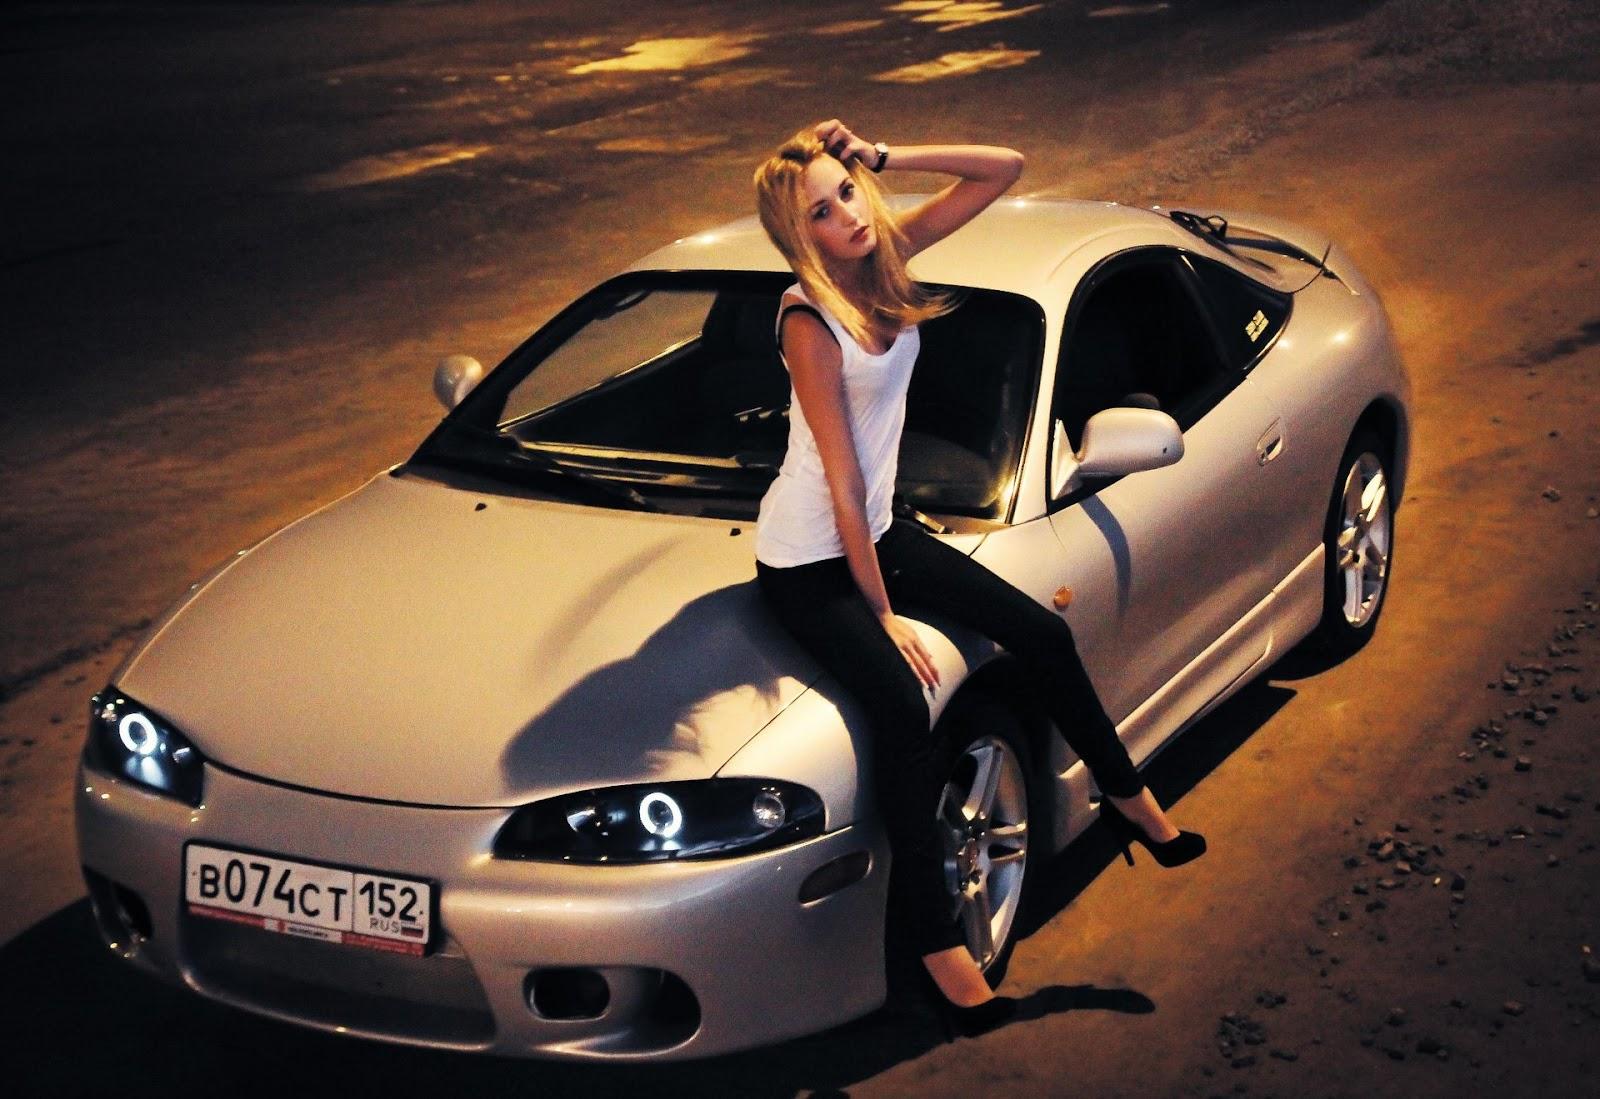 06 mitsubishi galant with 350 Zdjecia 114 Dziewczyny on Lucas galant sao Paulo capital 06 additionally Jika Polisi Kita Menggunakan Aston Martin V8 together with File 06 2007 Mitsubishi Eclipse likewise 111051675554 as well File 2nd generation Mitsubishi Galant  CE A3 Turbo rear.